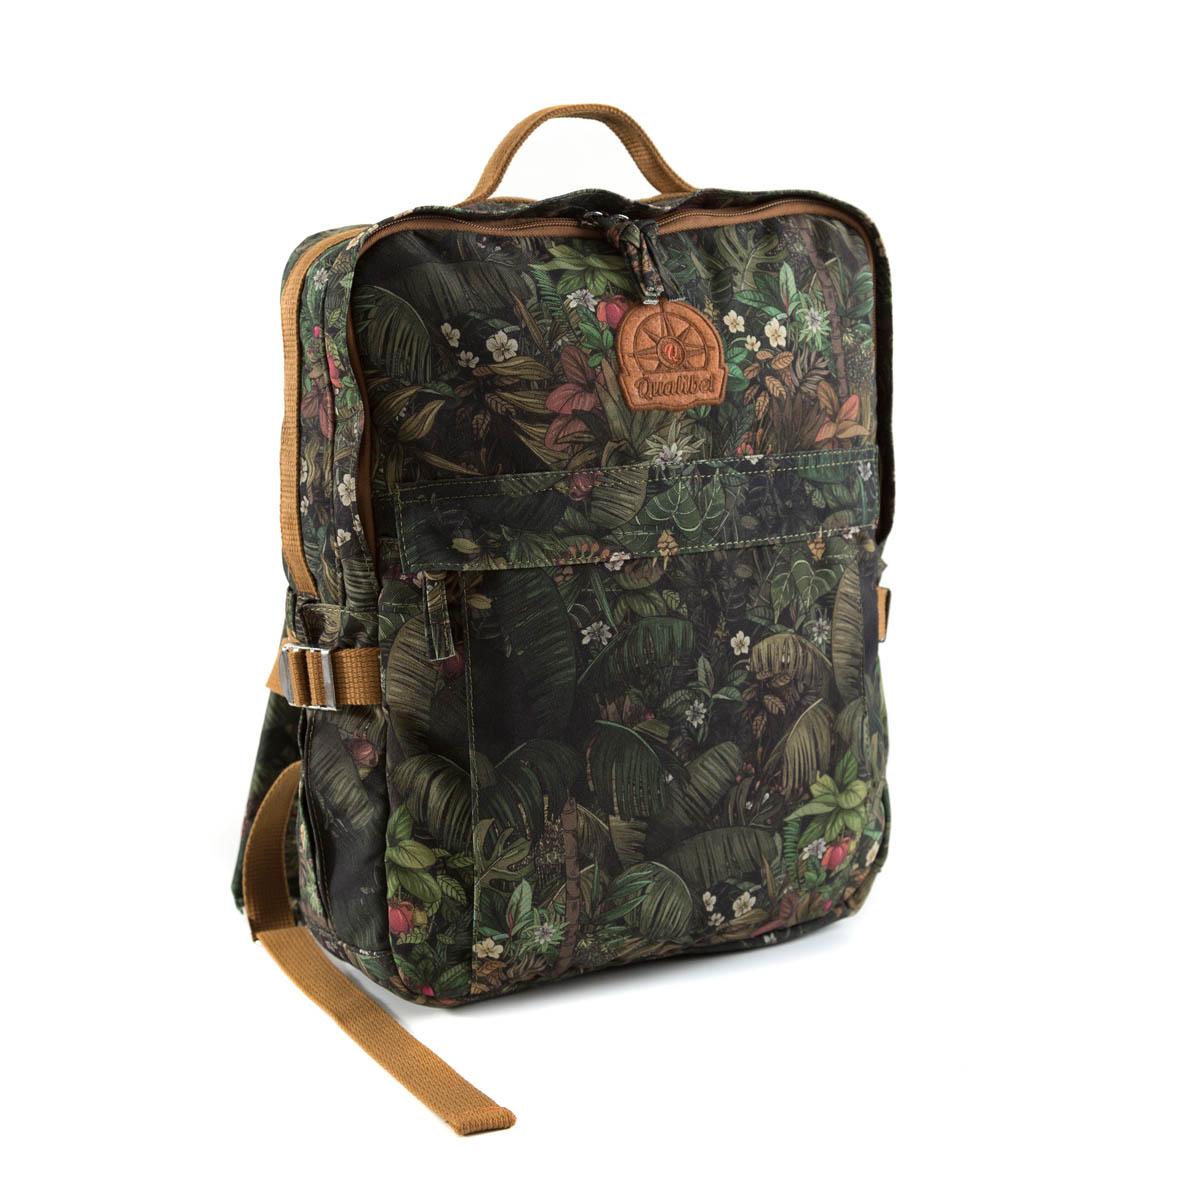 Square Backpack Amazonas (Vegan)